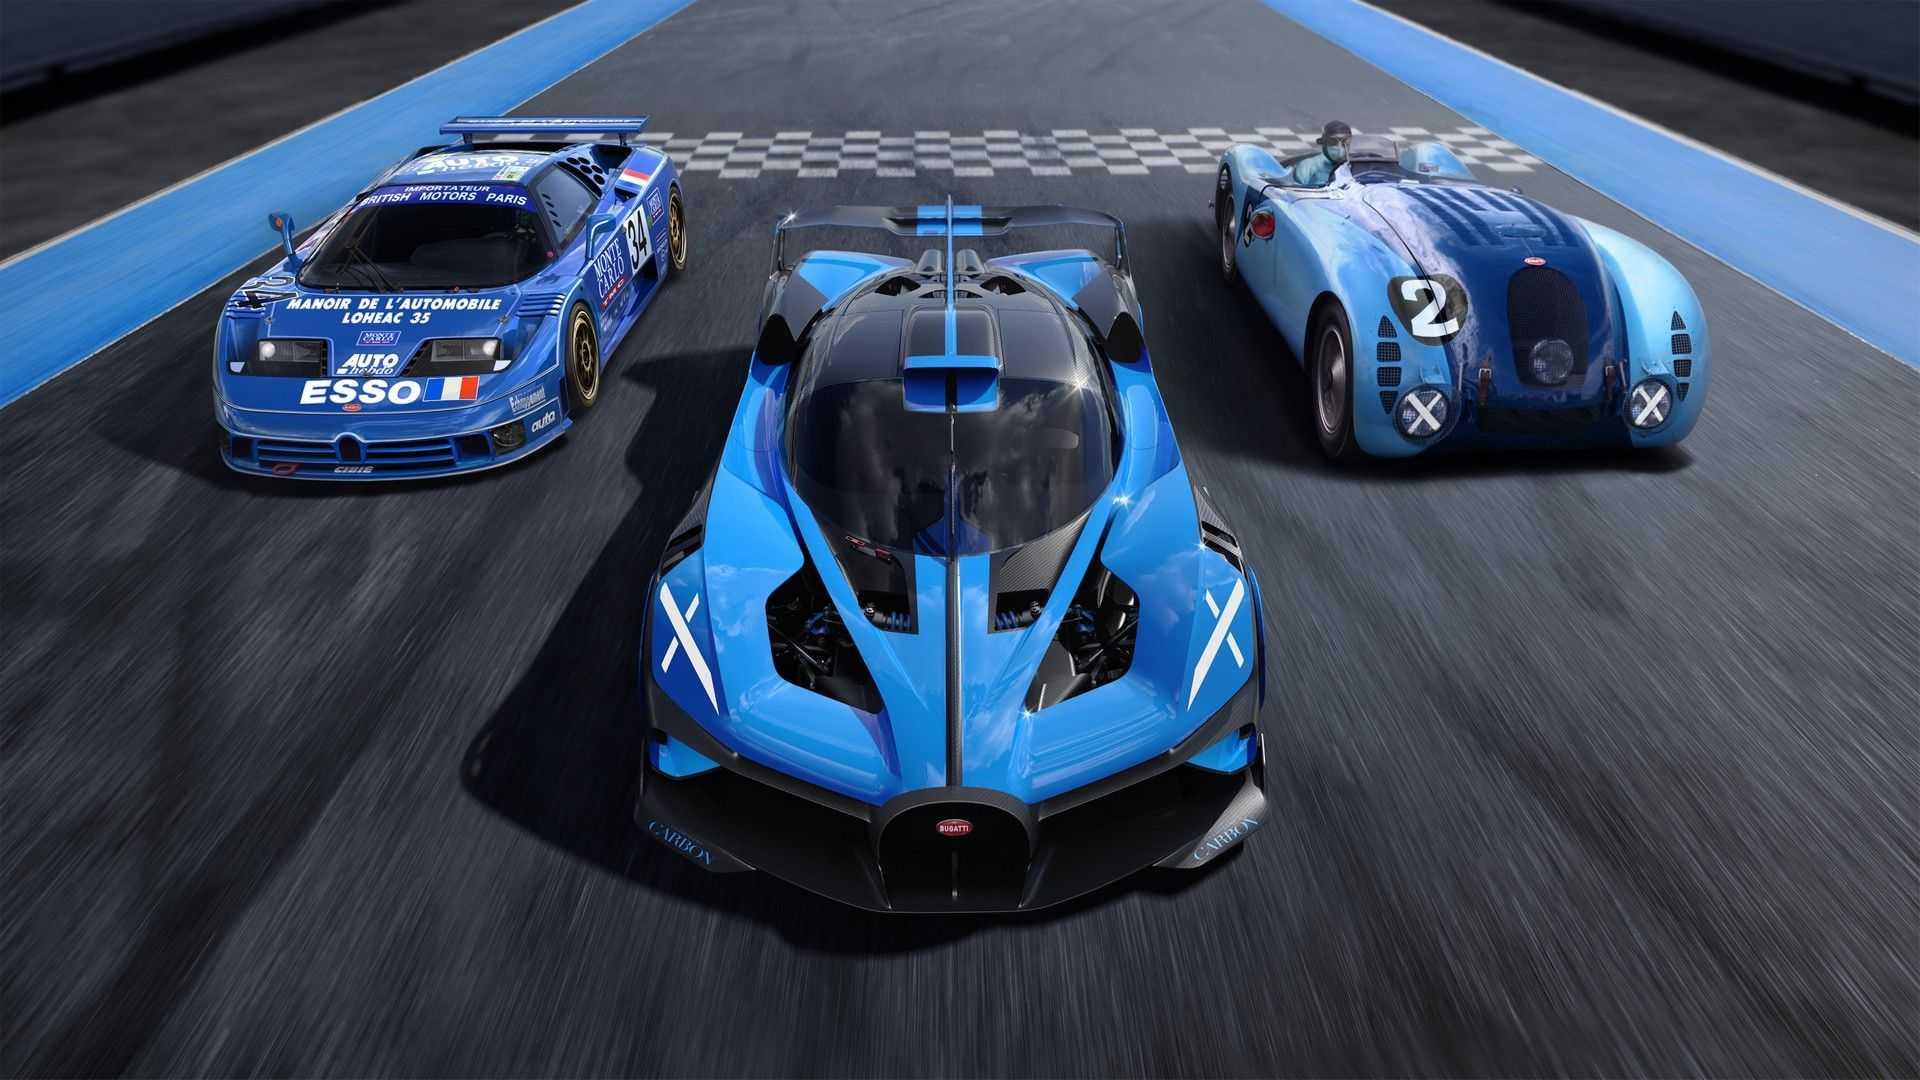 Bugatti Bolide with old Bugatti race cars